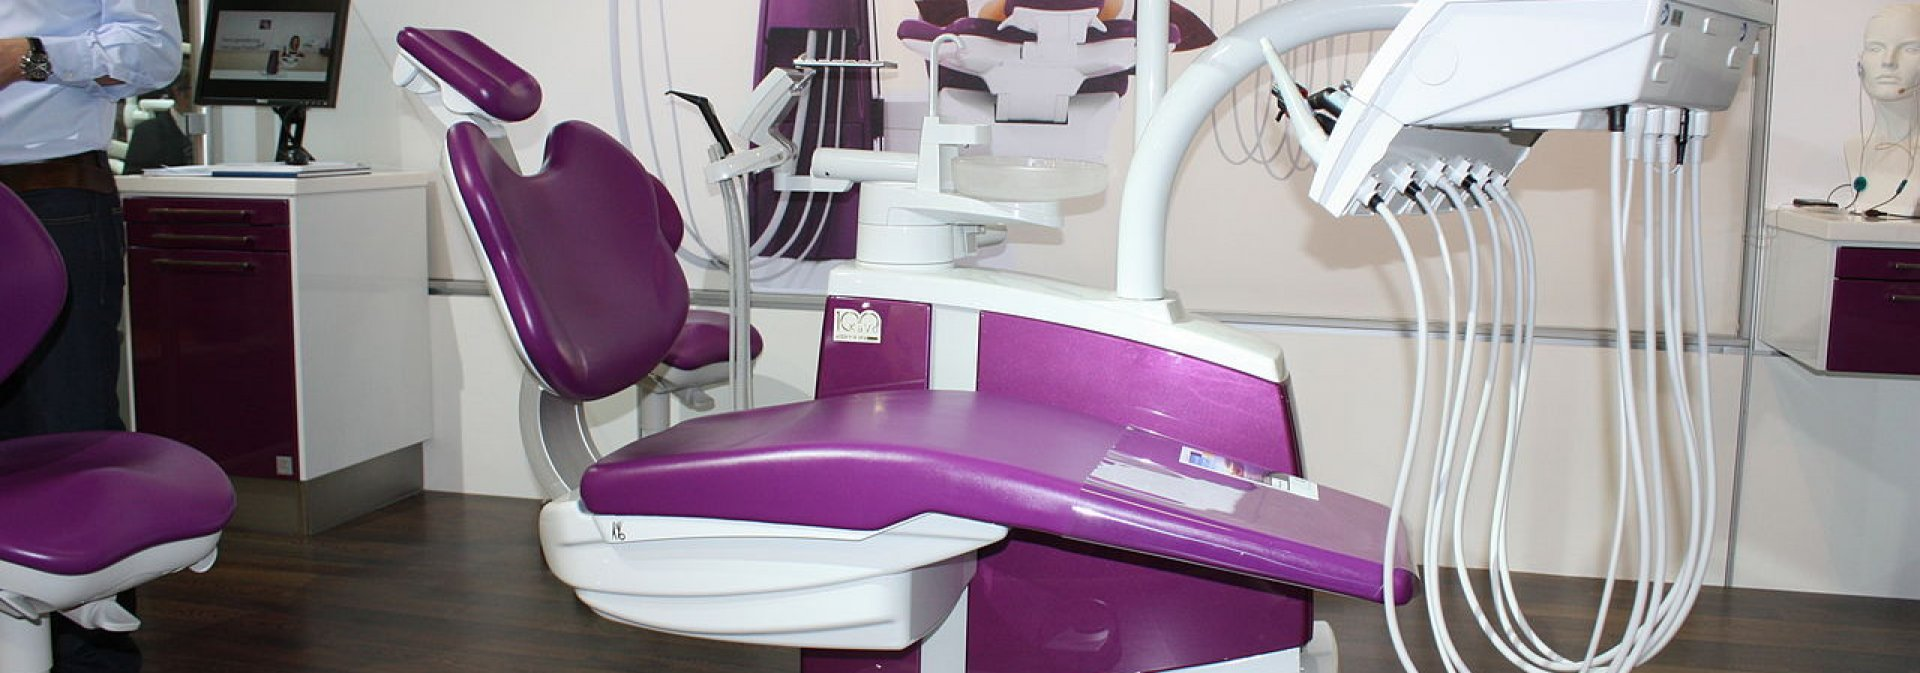 MB Dental, Cluj-Napoca, Cluj